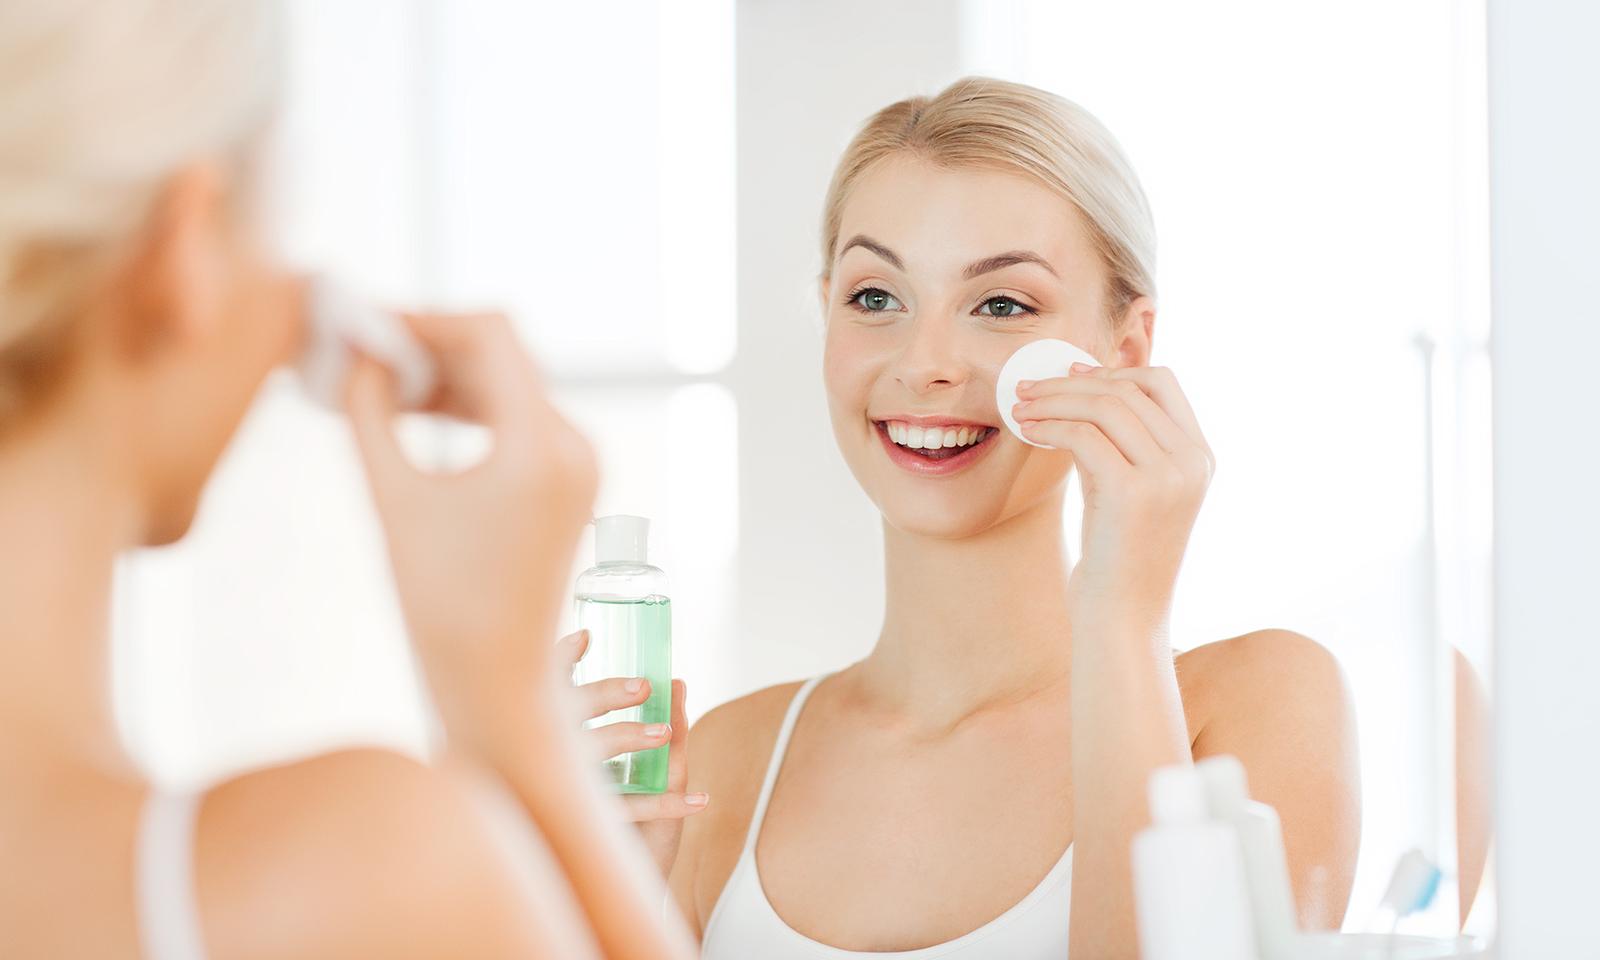 natural-tips-to-remove-your-eye-makeup-main-image-woman-removing-eye-makeup